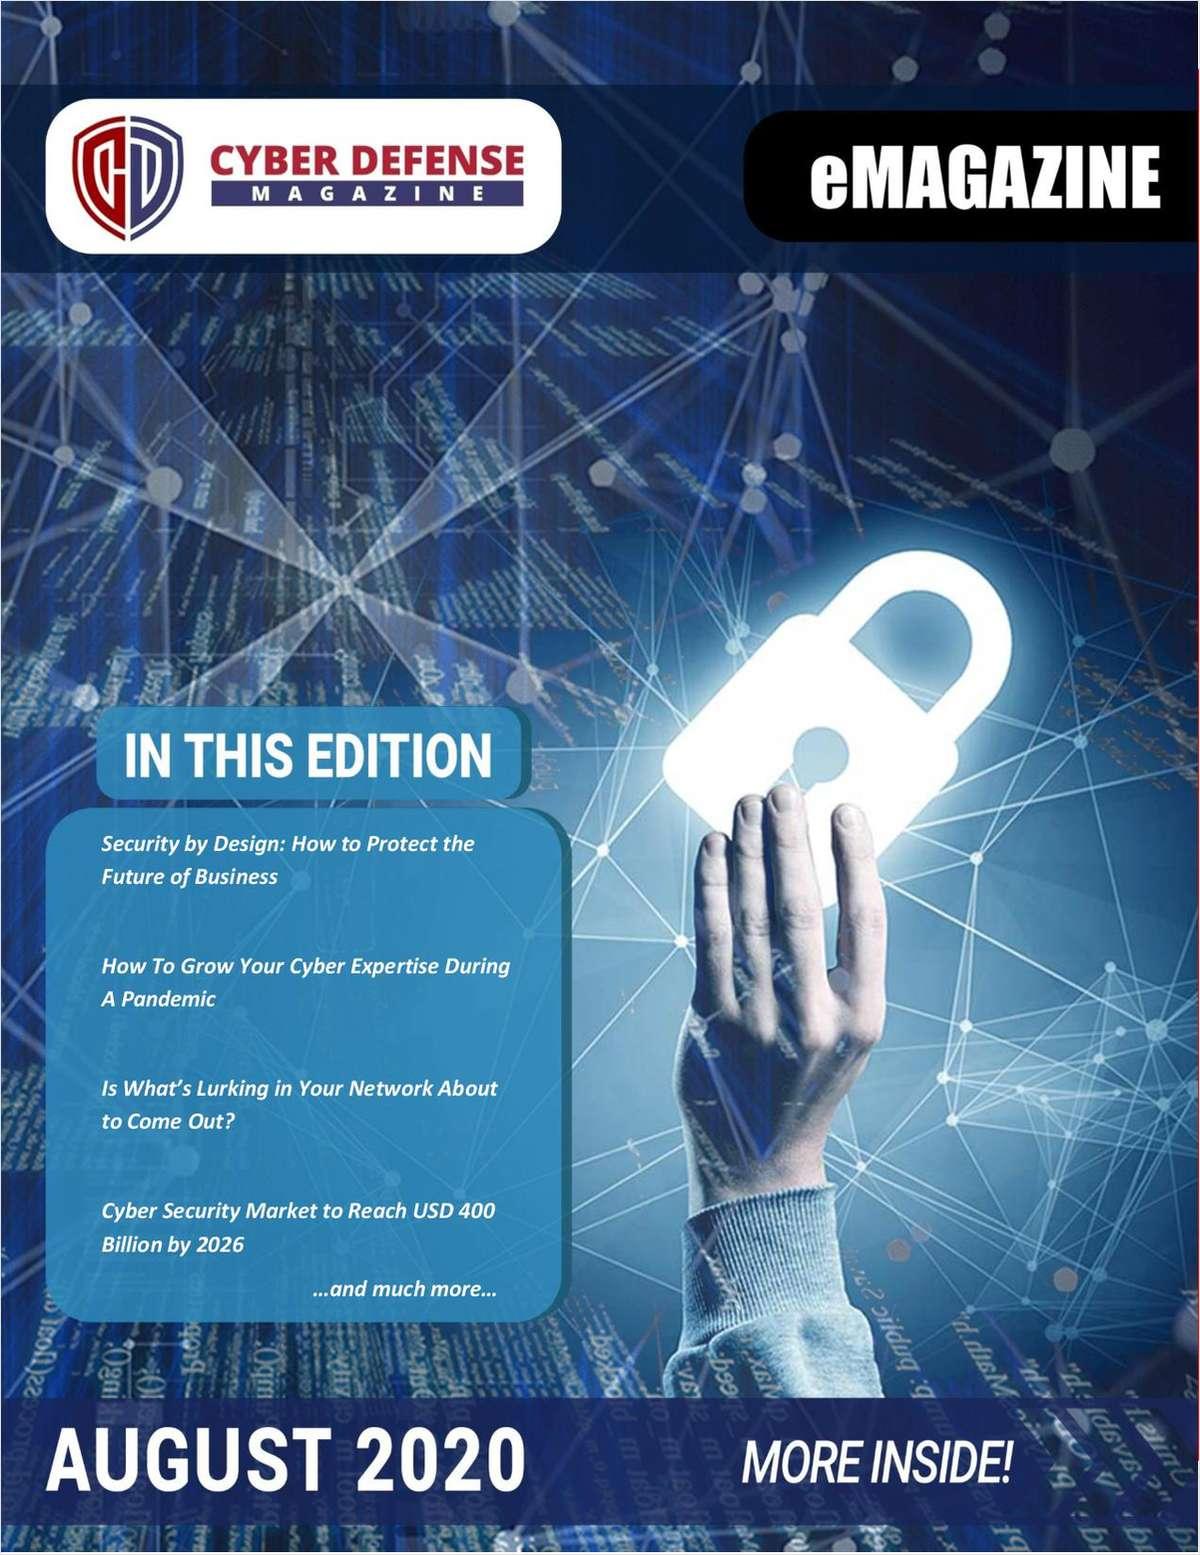 Cyber Defense Magazine August 2020 Edition